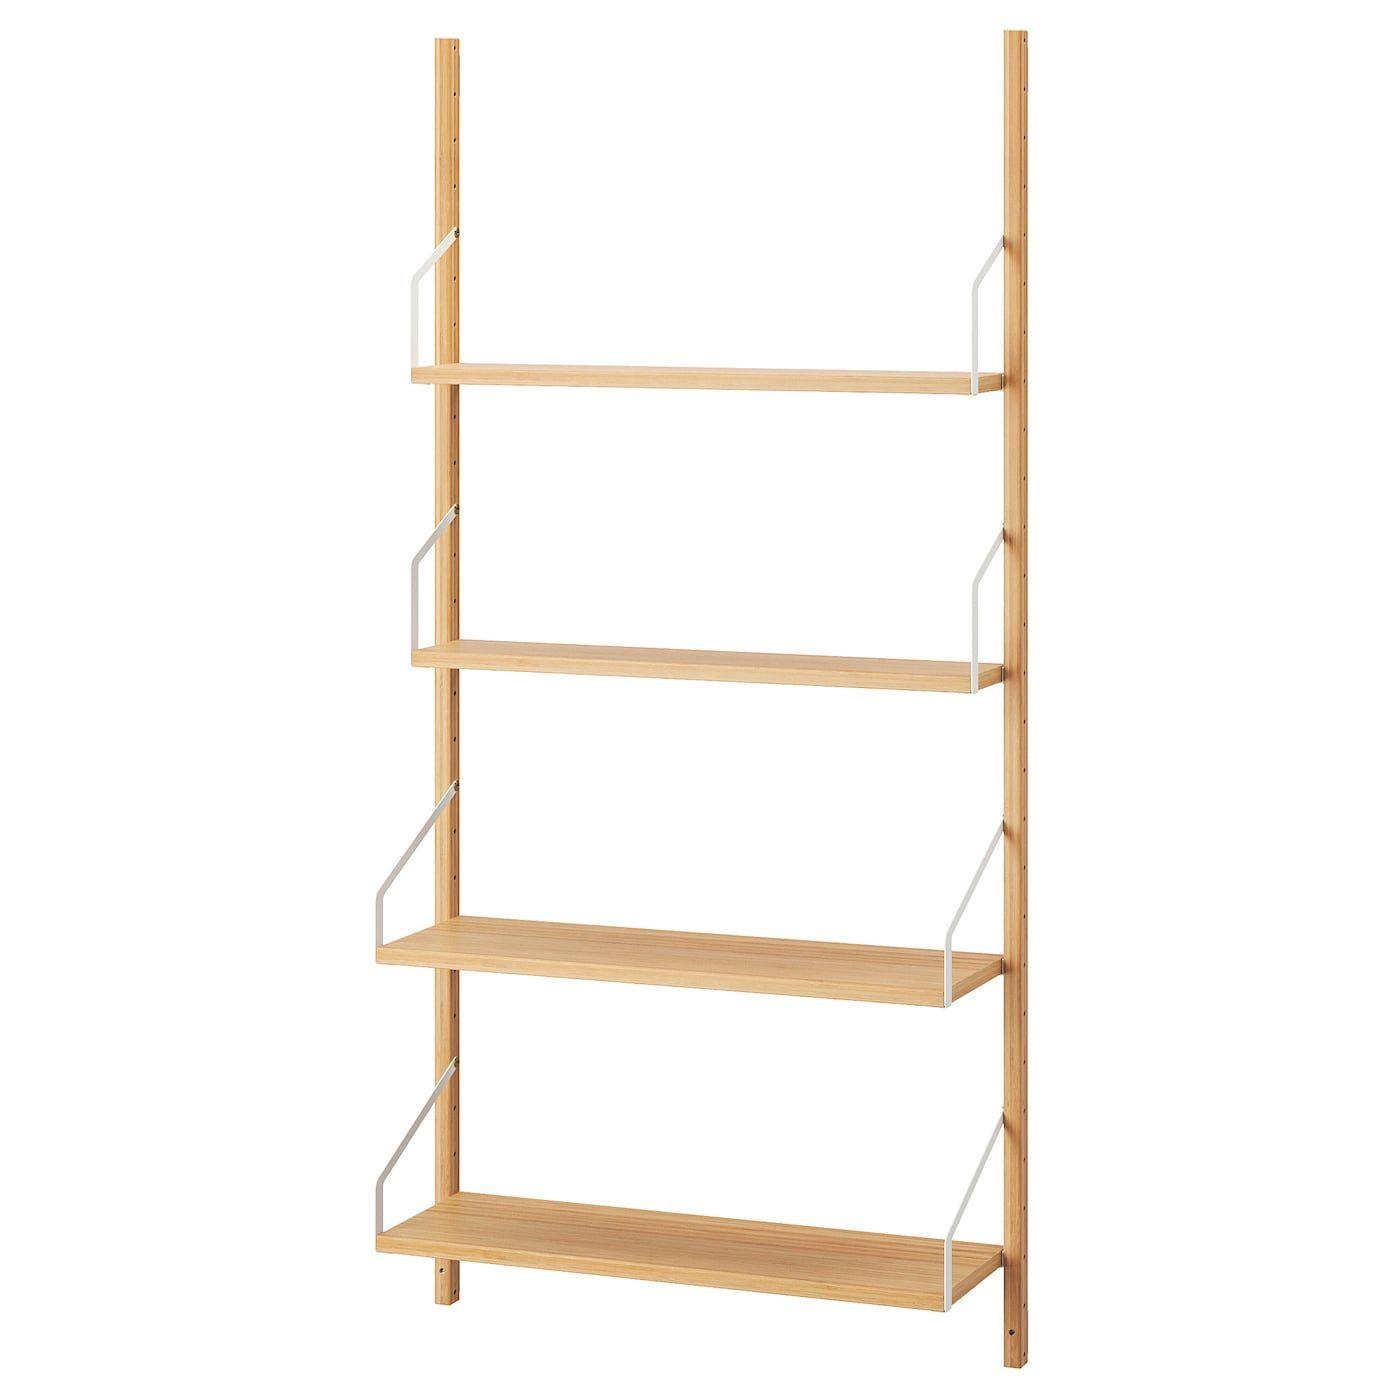 Svalnas Combinaison De Rangement Murale Bambou 86x25x176 Cm Ikea In 2020 Wall Mounted Shelves Shelves Ikea